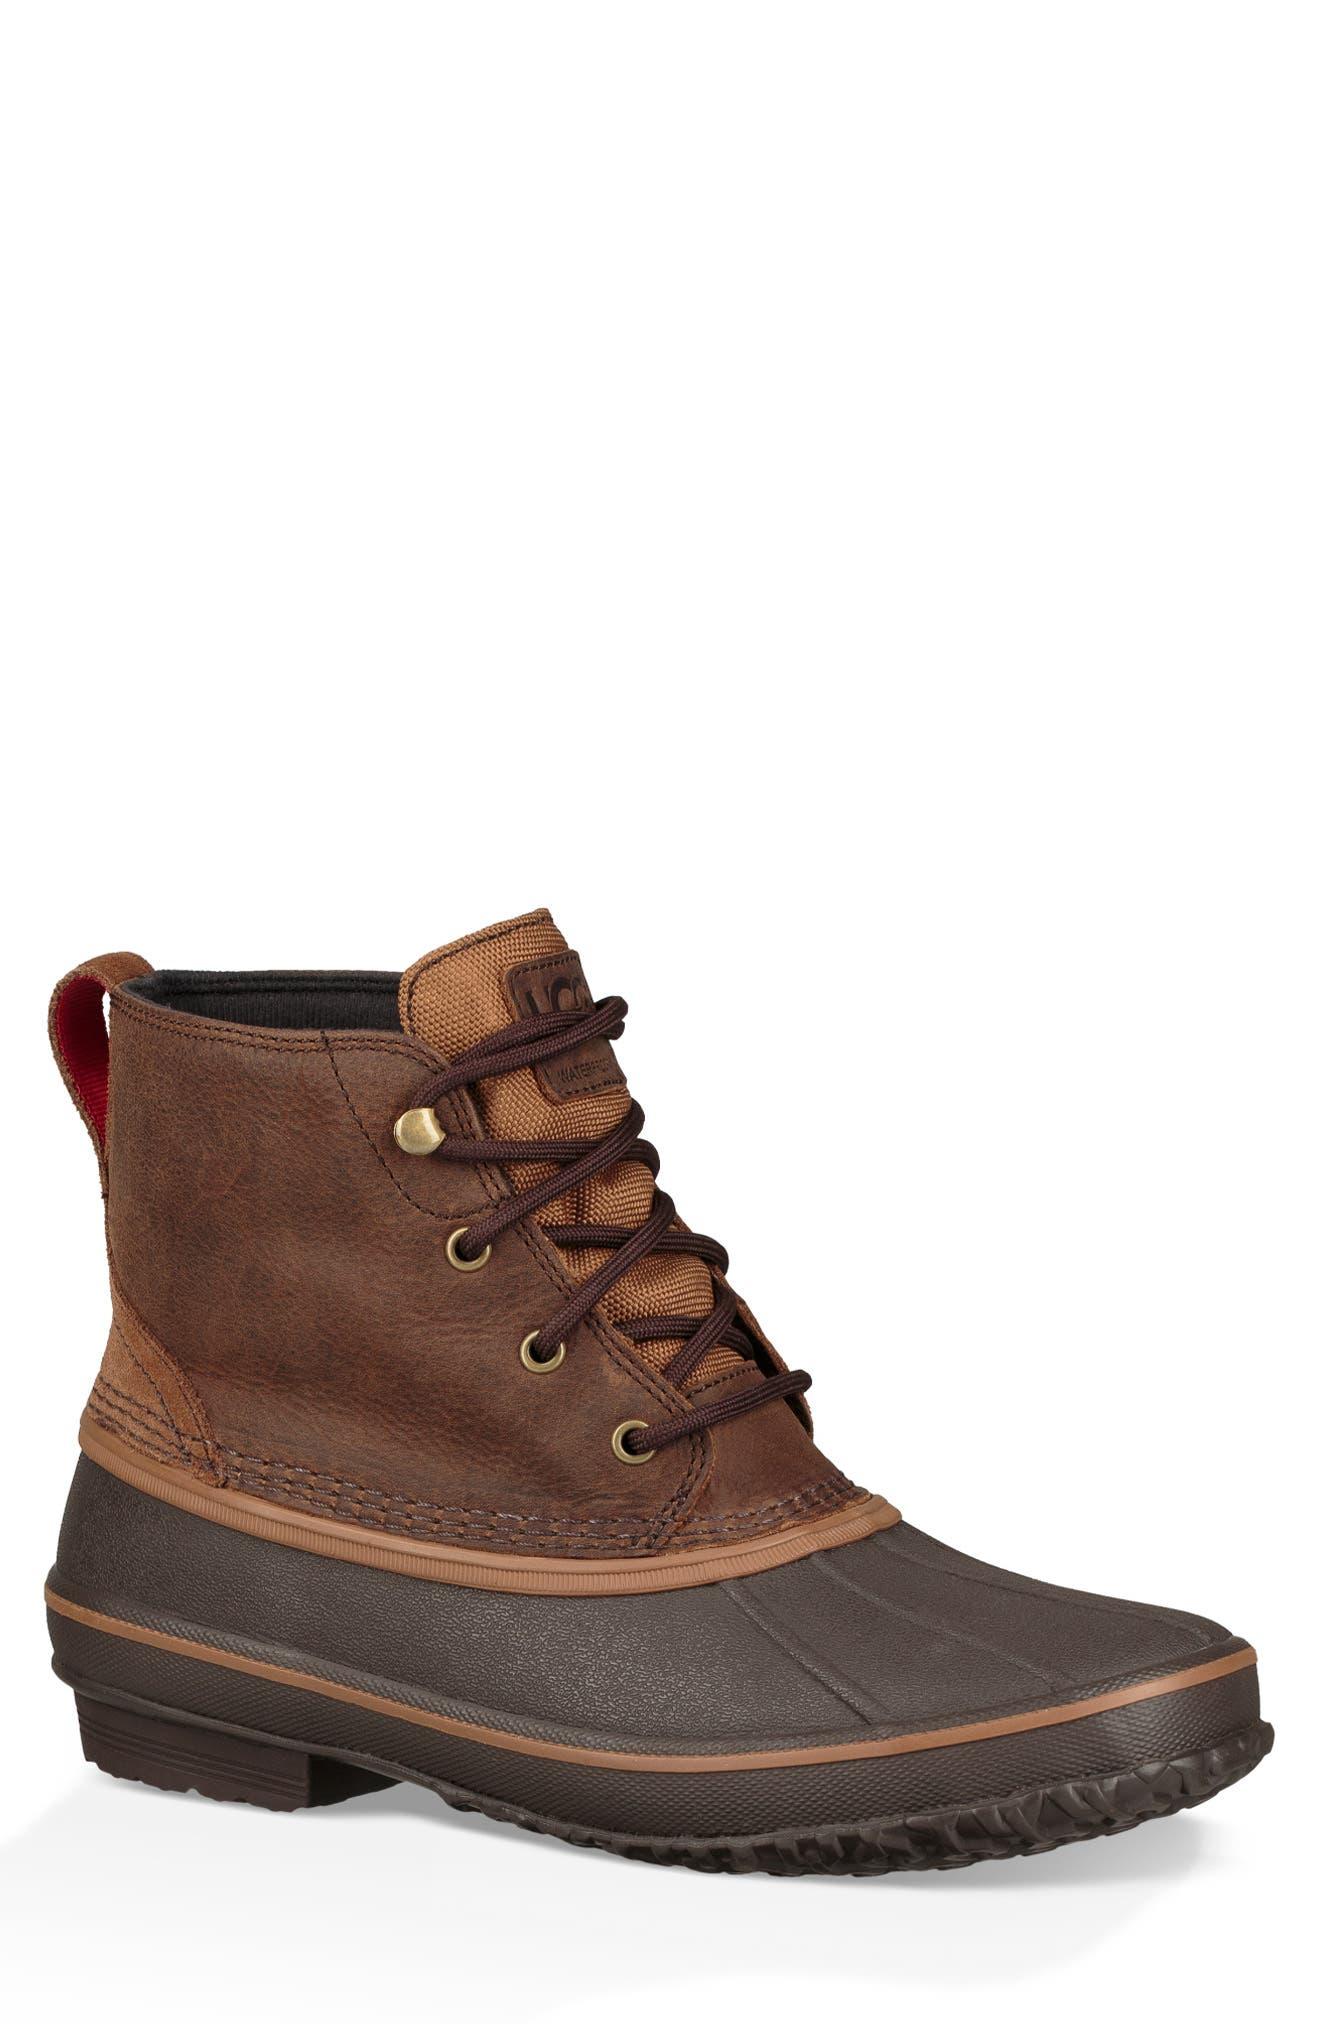 Ugg Zetik Waterproof Rain Boot, Brown